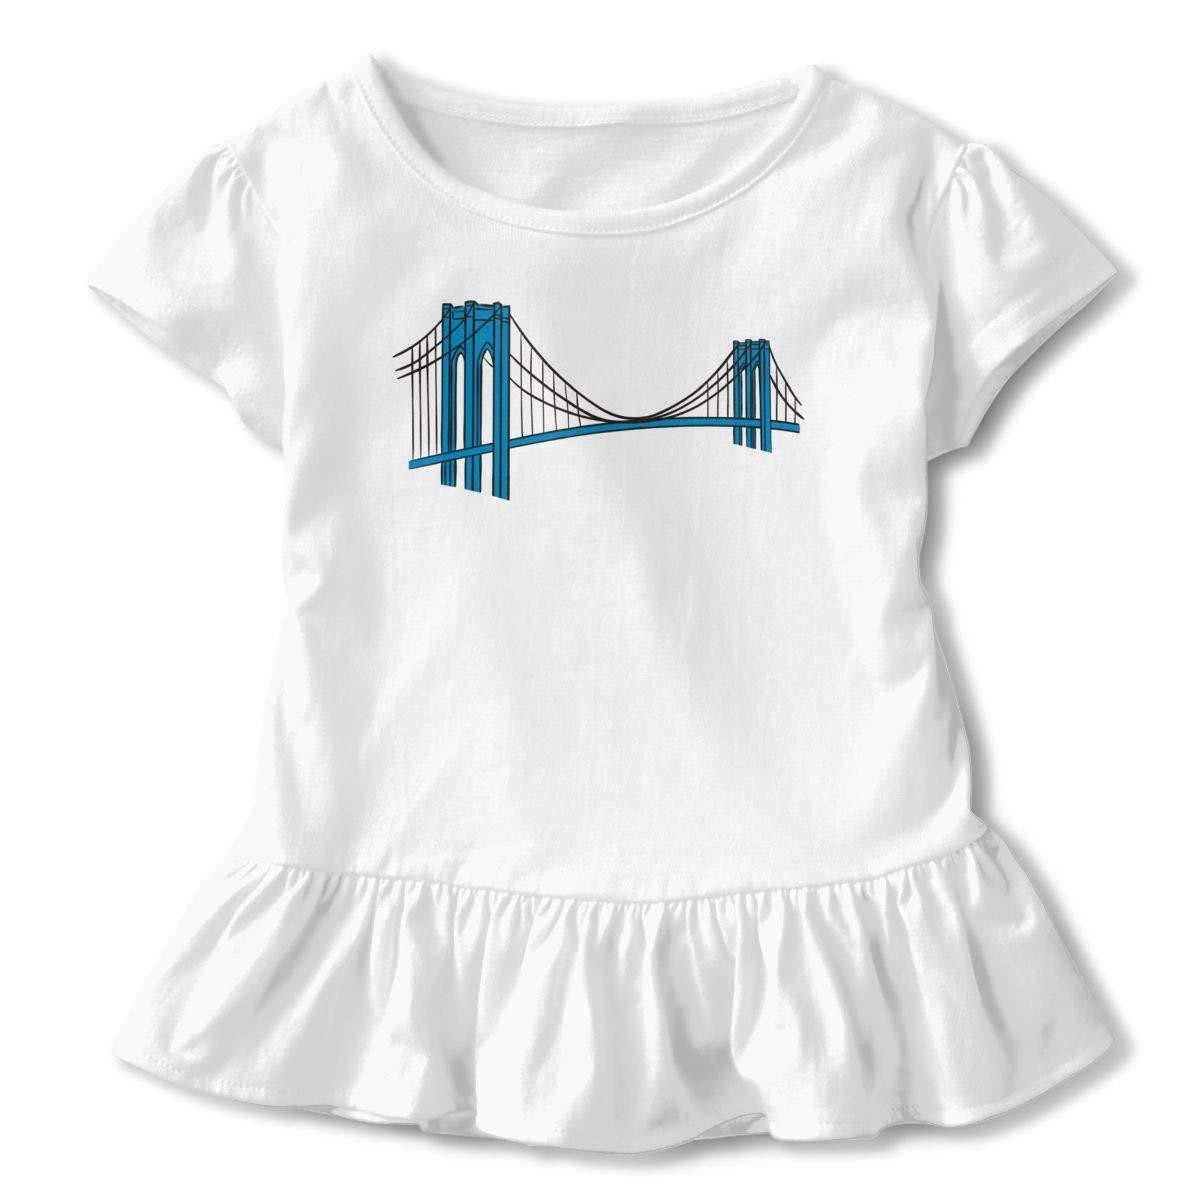 Brooklyn Bridge Shirt Design Baby Girl Flounced T Shirts Tops for 2-6T Kids Girls